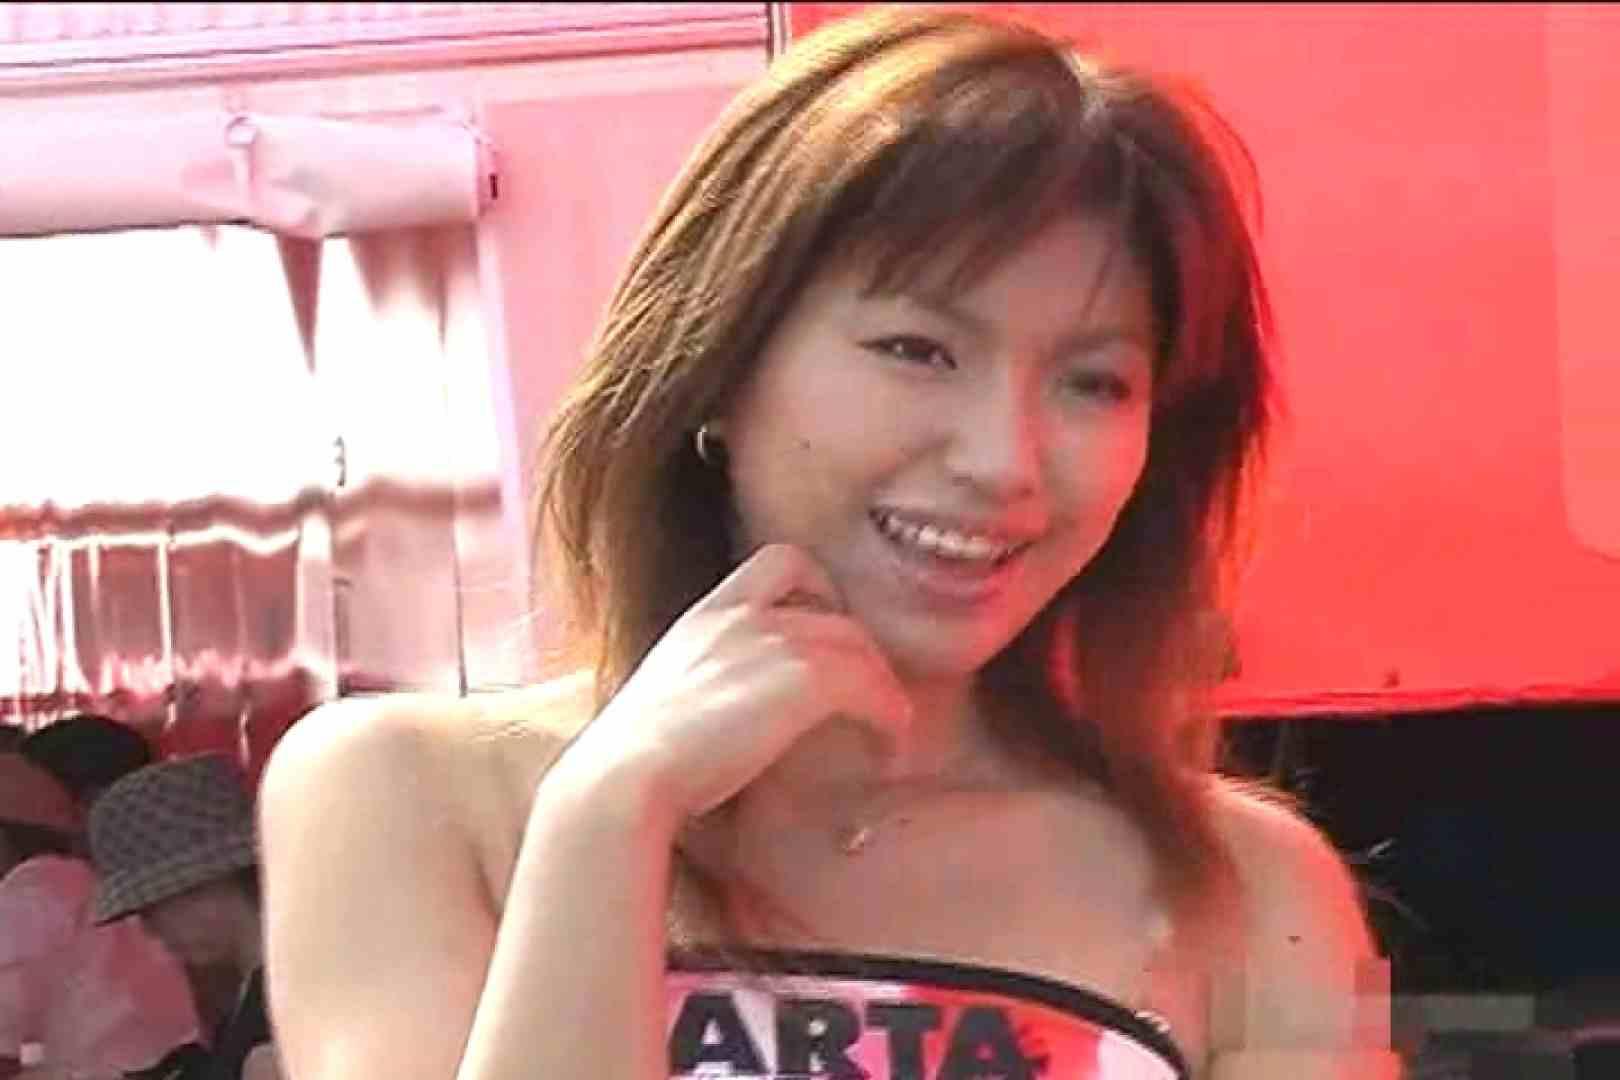 RQカメラ地獄Vol.14 美女OL  42連発 14